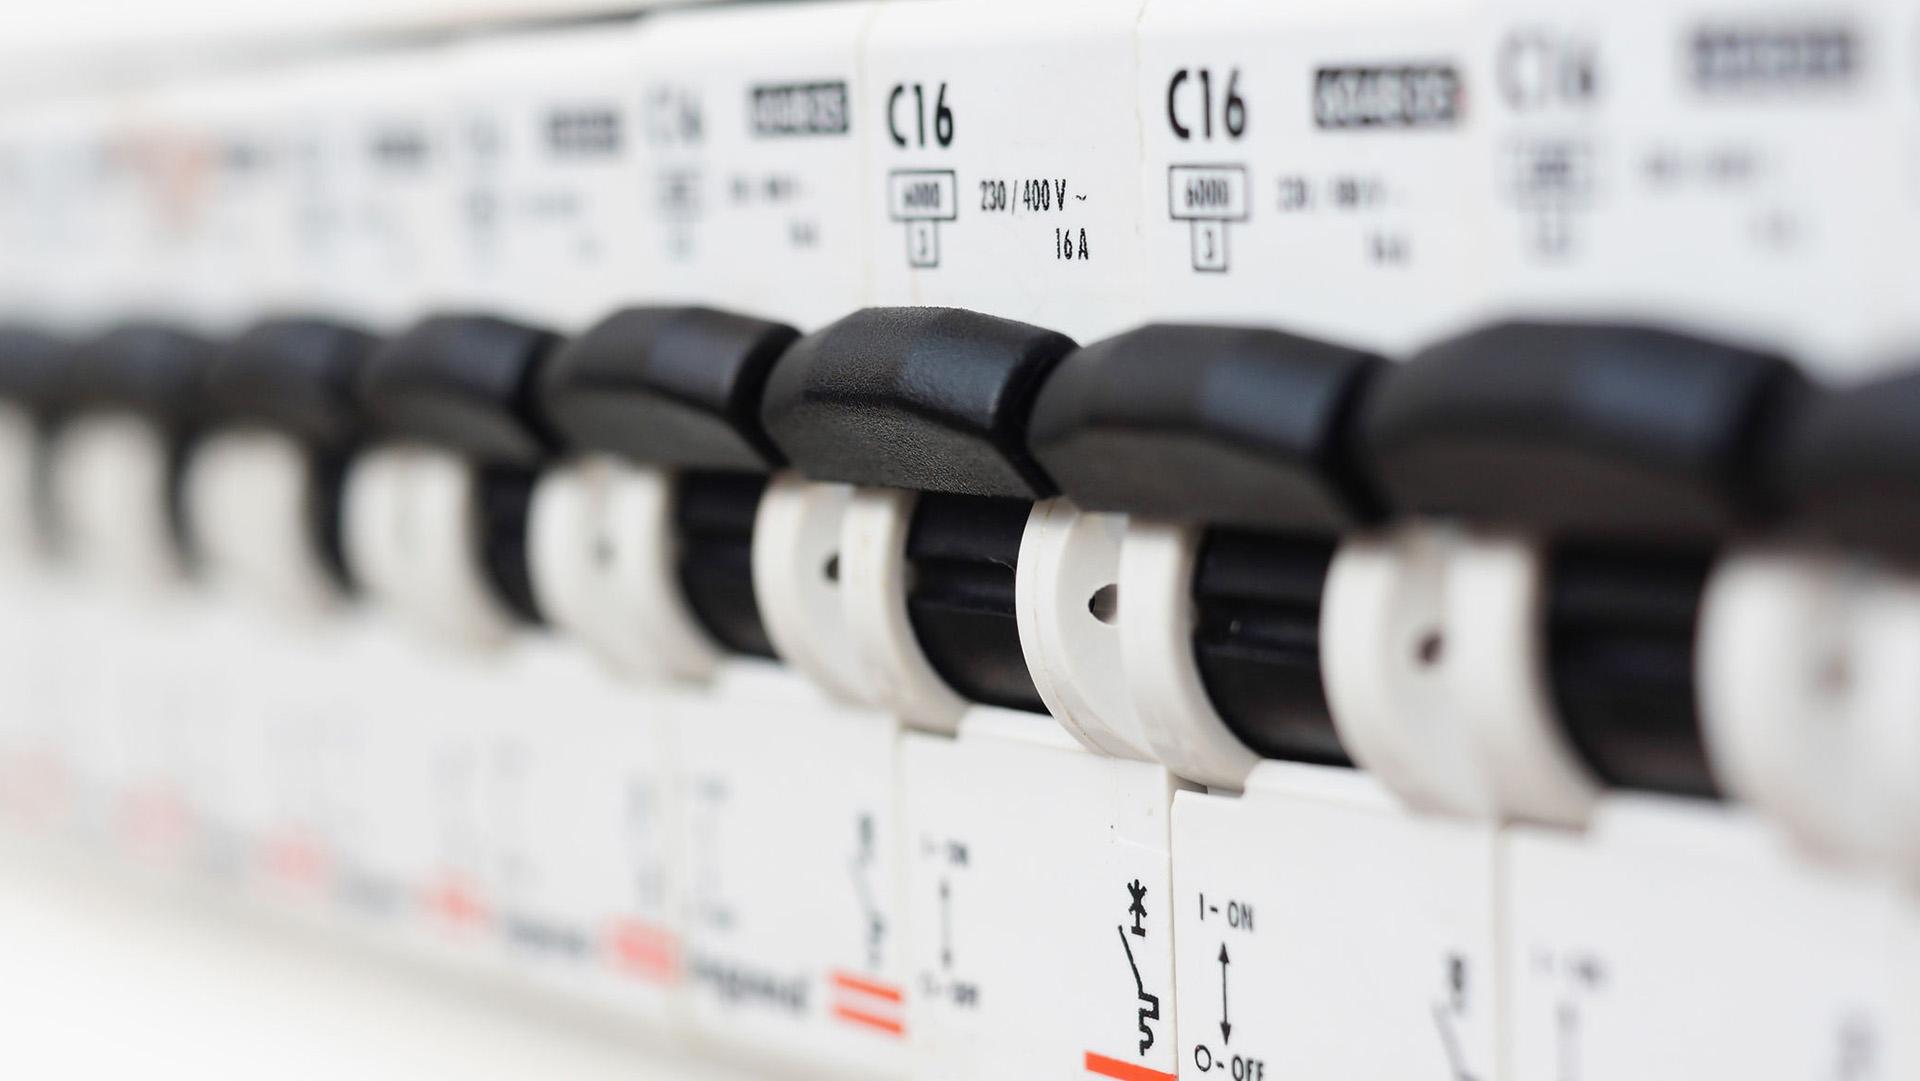 realizzazione impianto elettrico construction of an electrical system